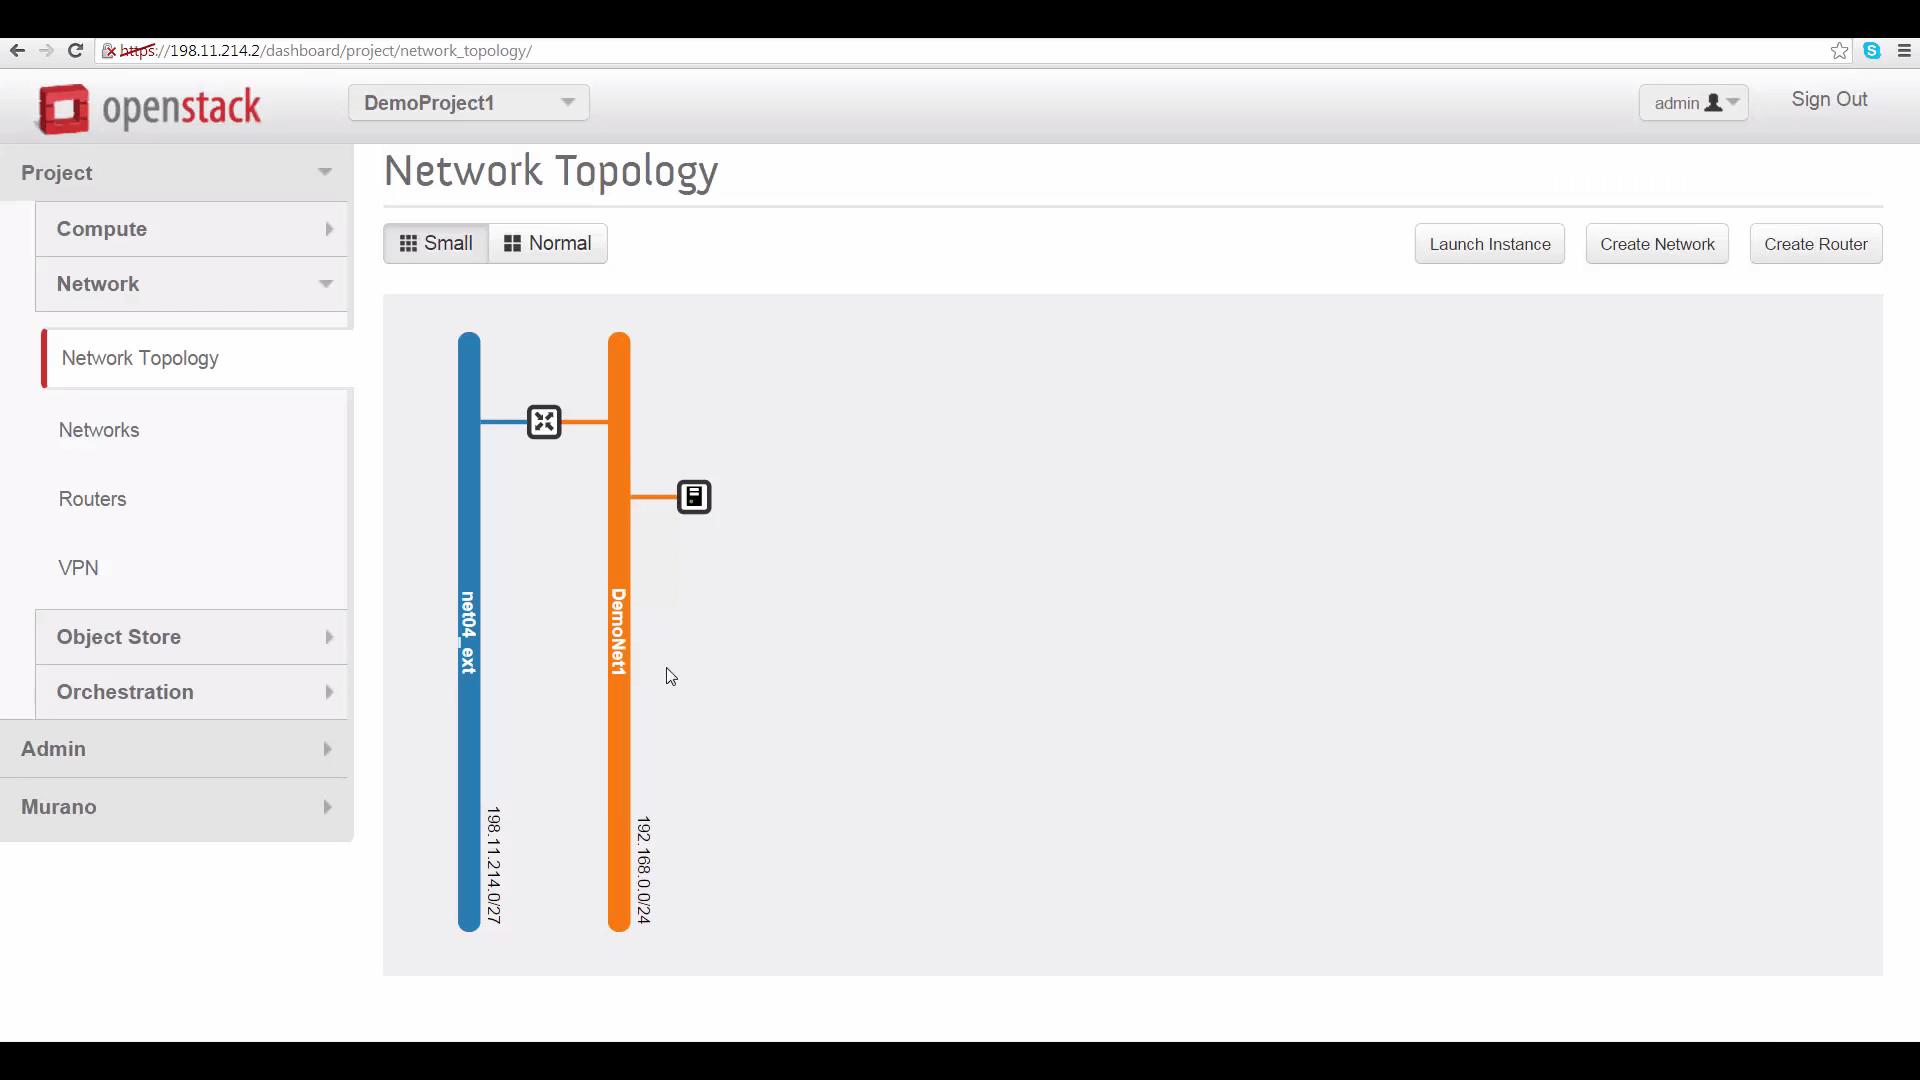 screenshot of DemoProject1's network topology on Cloud A